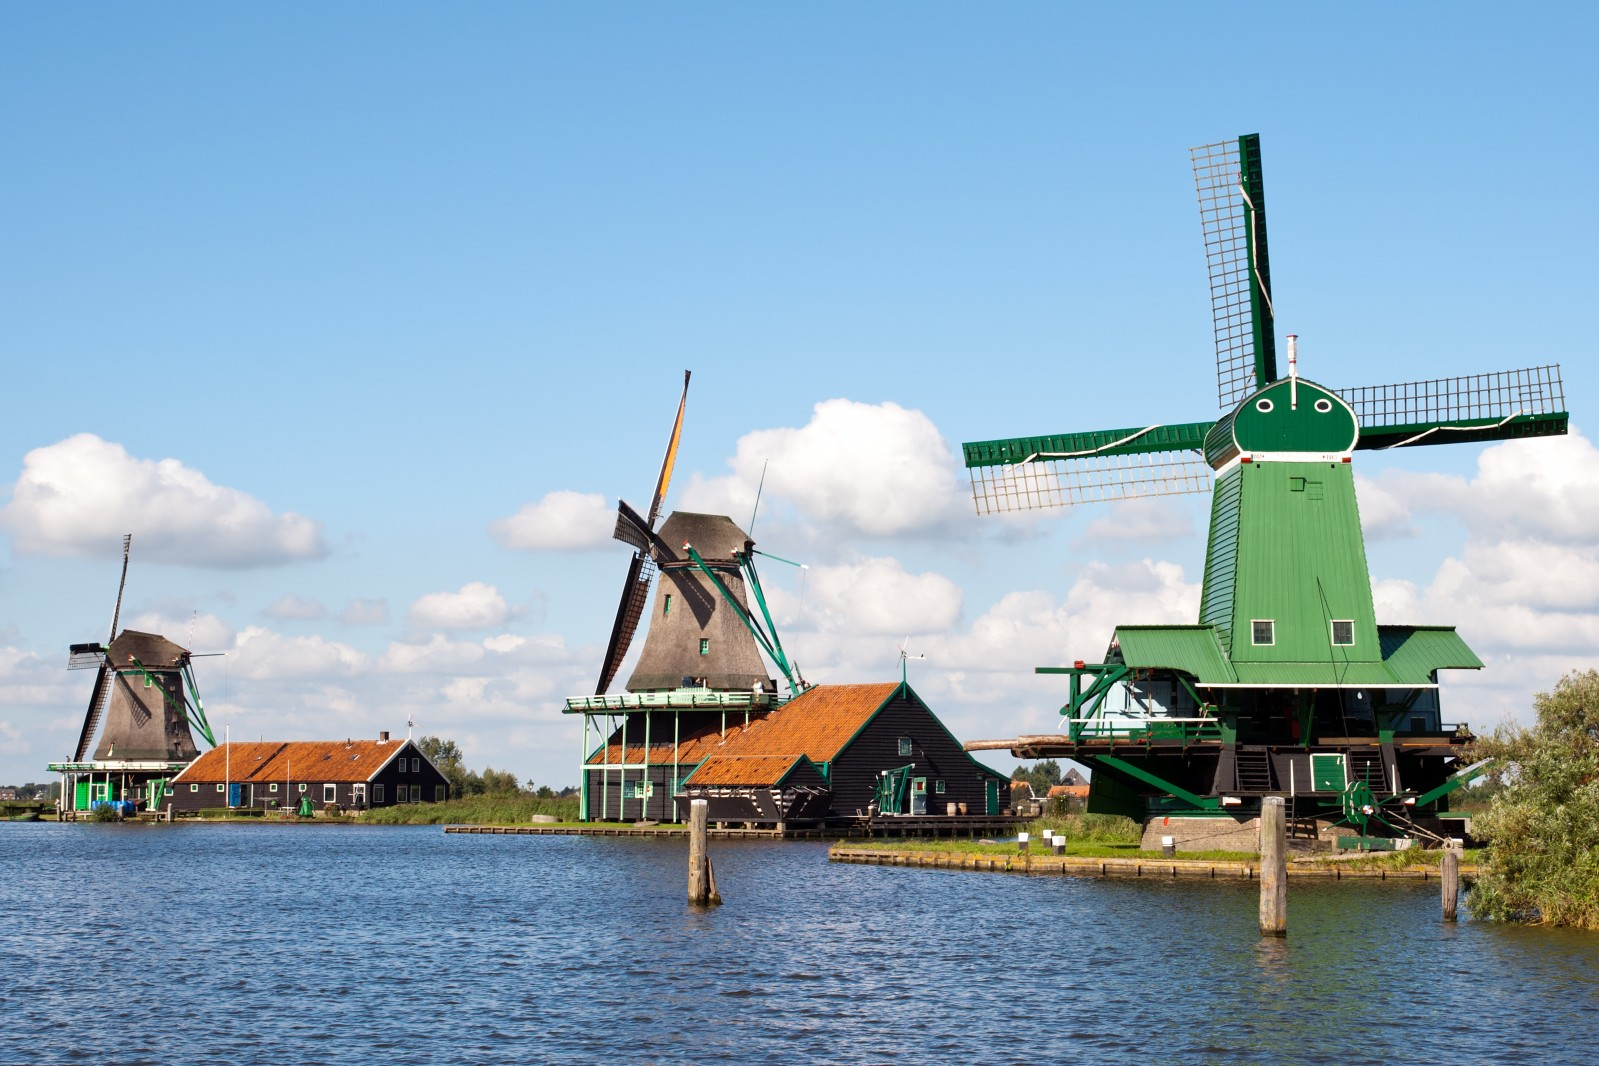 Zaanse-Schans-old-wind-mills-fishermans-village-holland-the-netherlands-tour-dutch-matters1-e1476986828964